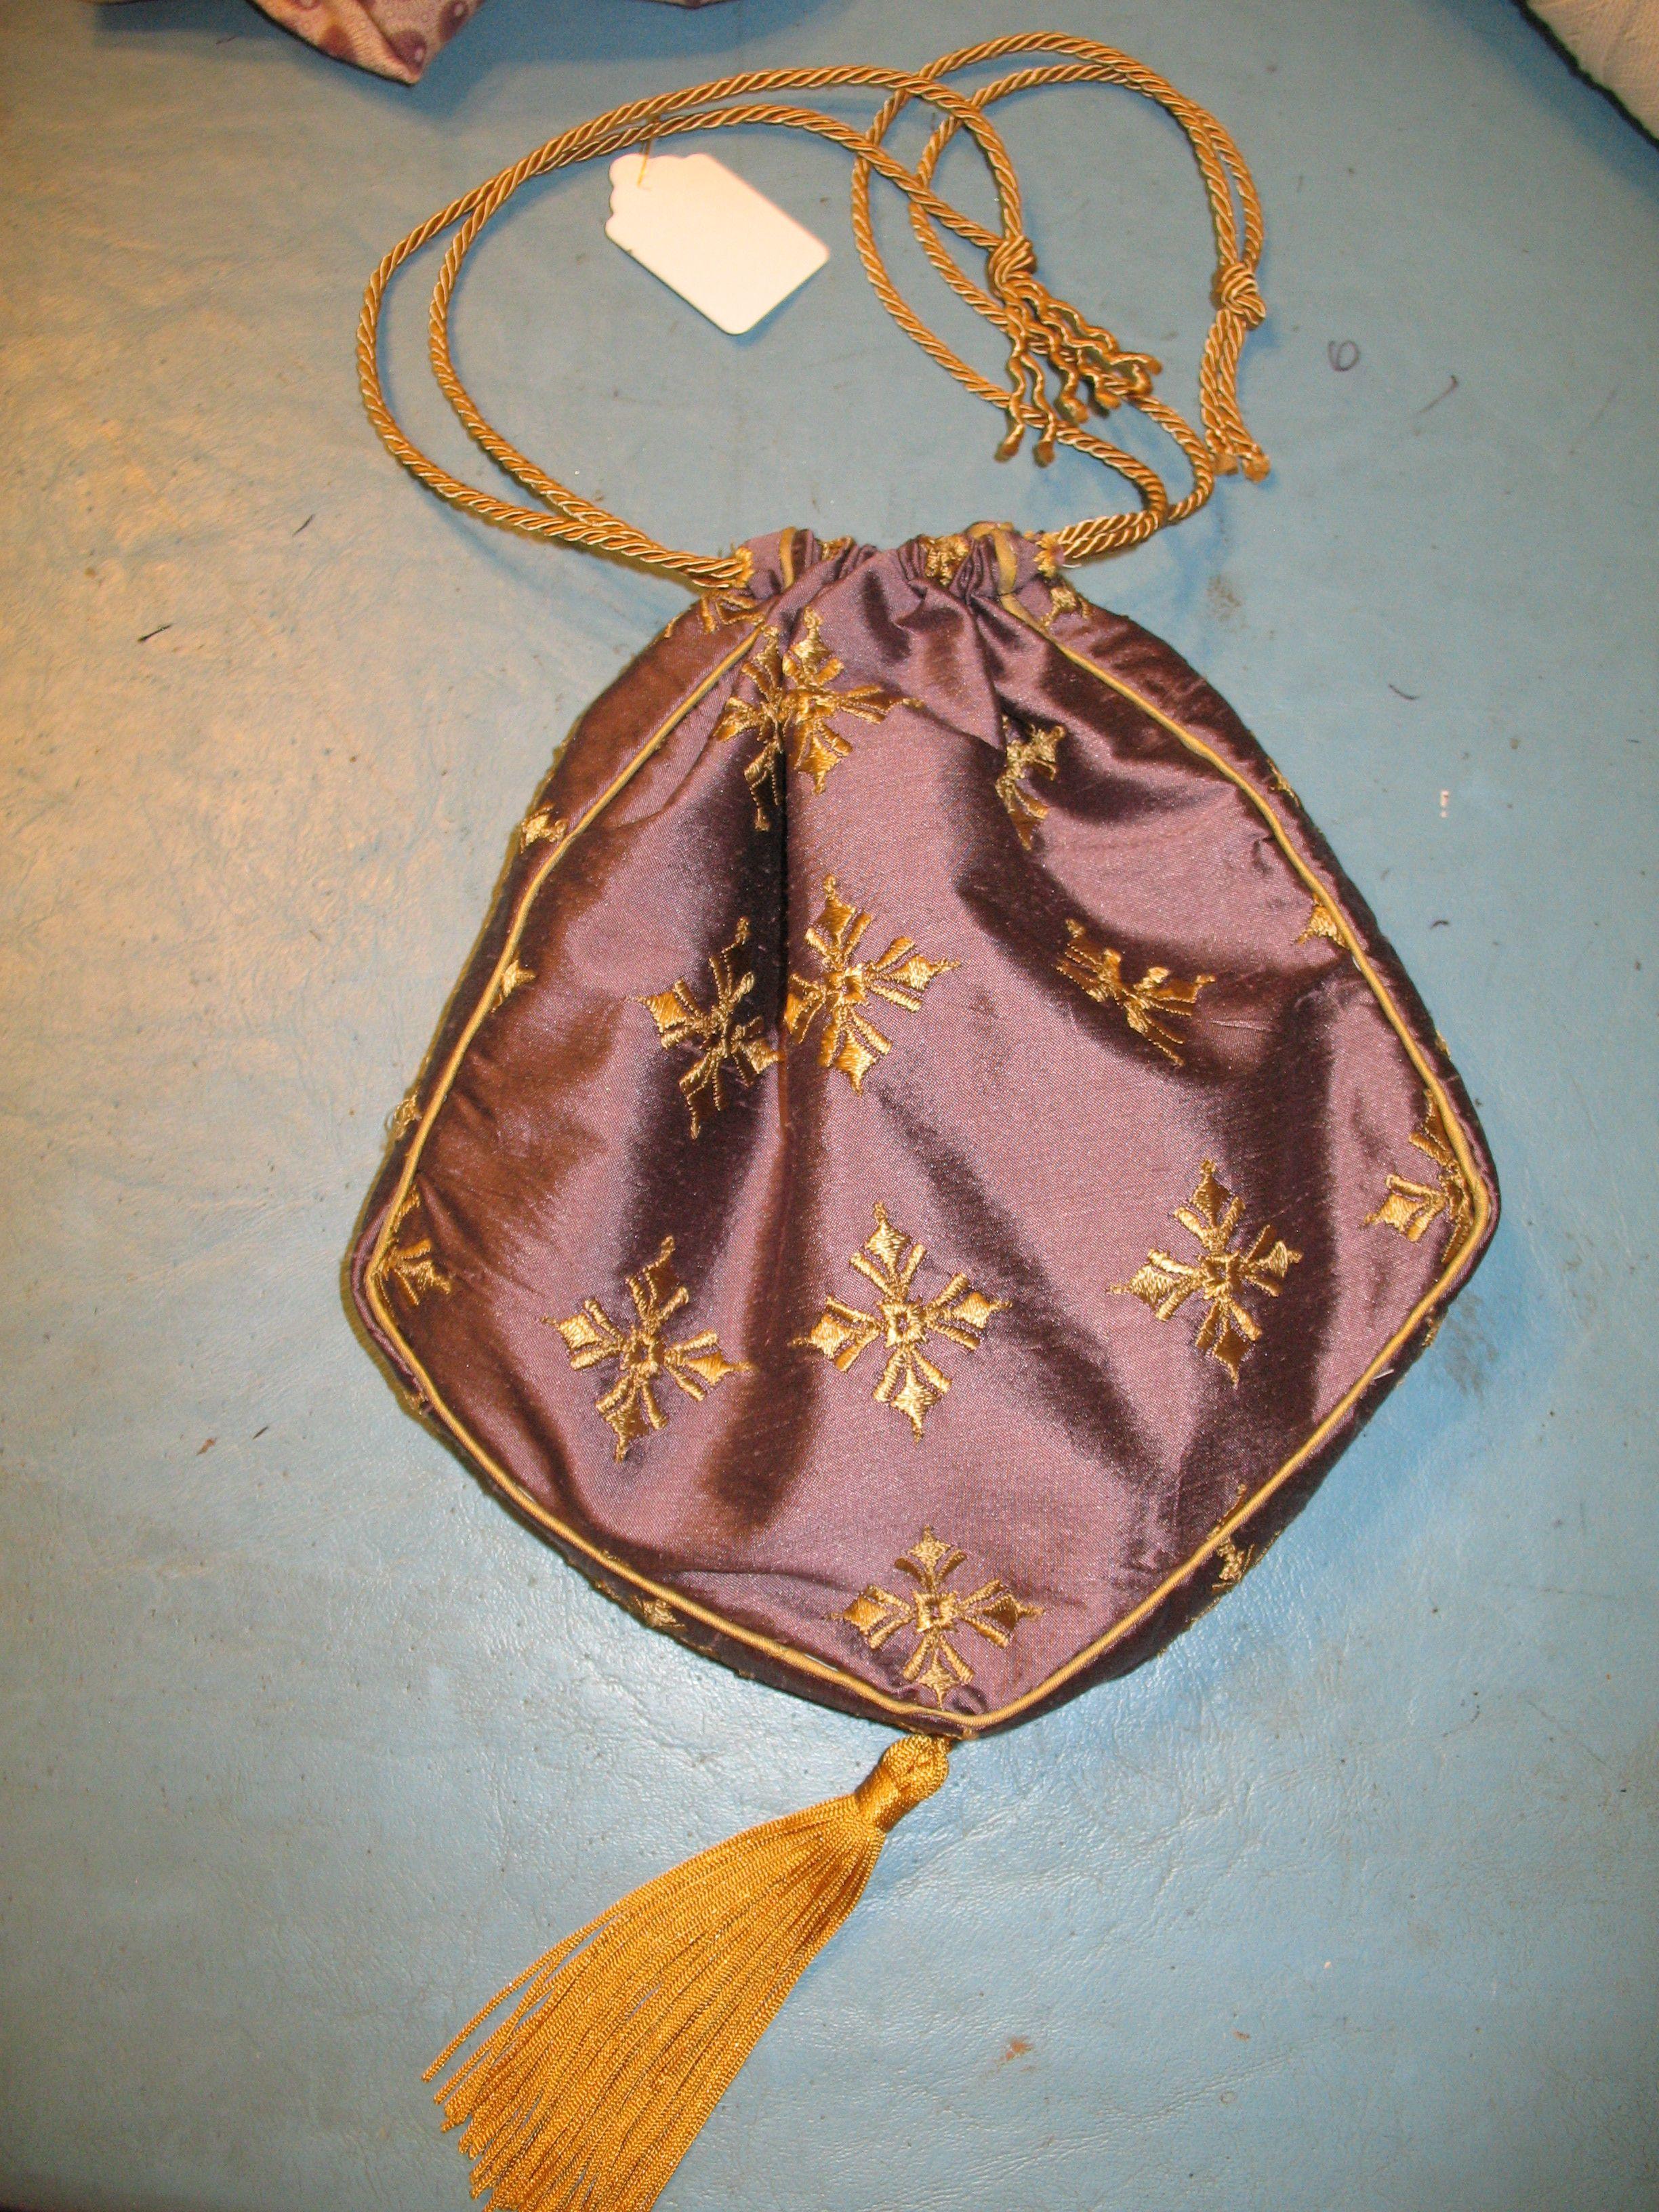 Silk hand-bag, entirely sewn by hand